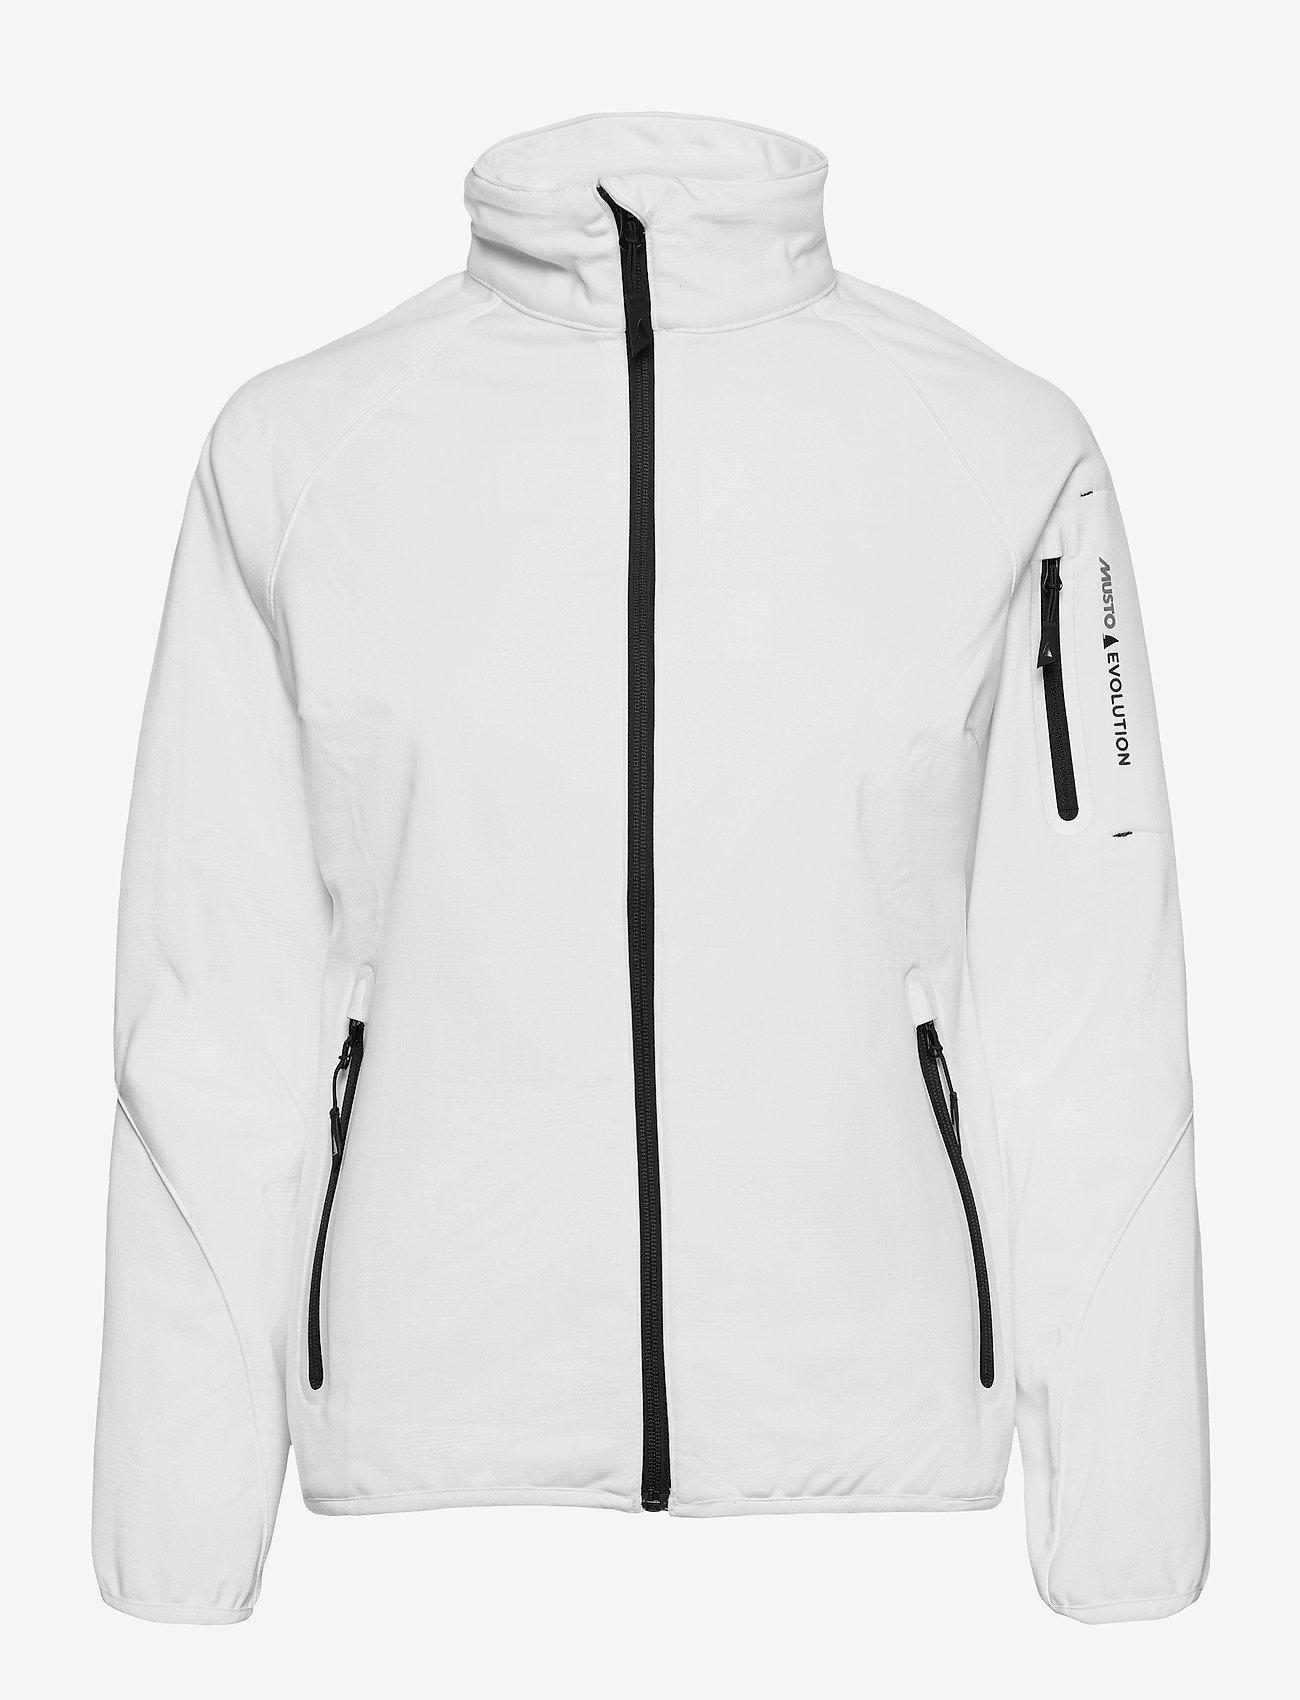 Musto - CREW SOFTSHELL JKT FW - sports jackets - white - 0